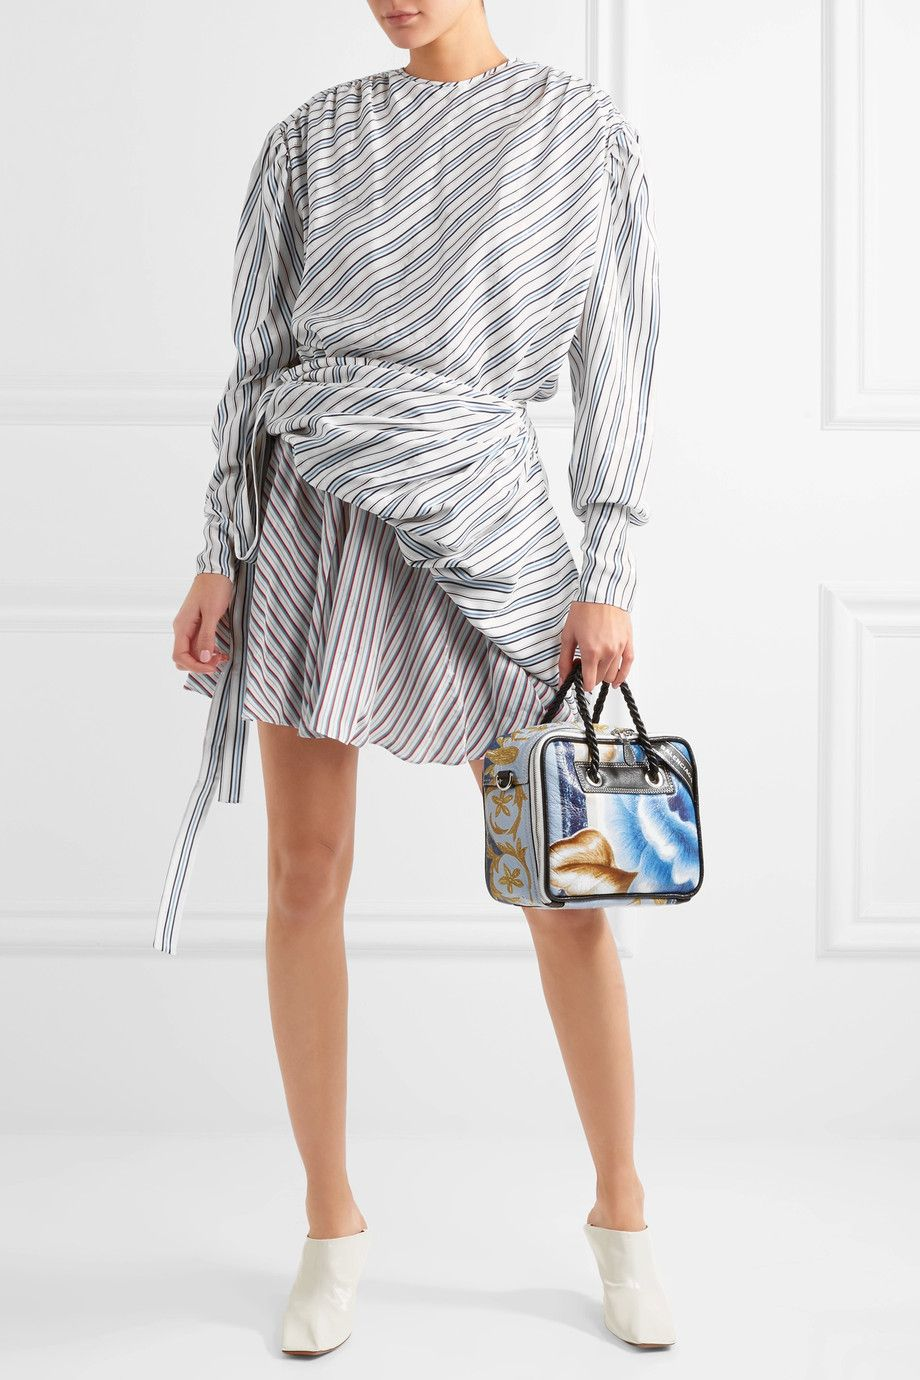 Sale 2018 Newest Hyper Online Gathered Printed Silk-jacquard Midi Dress - White Balenciaga Clearance Pre Order Wide Range Of TKsPscOk